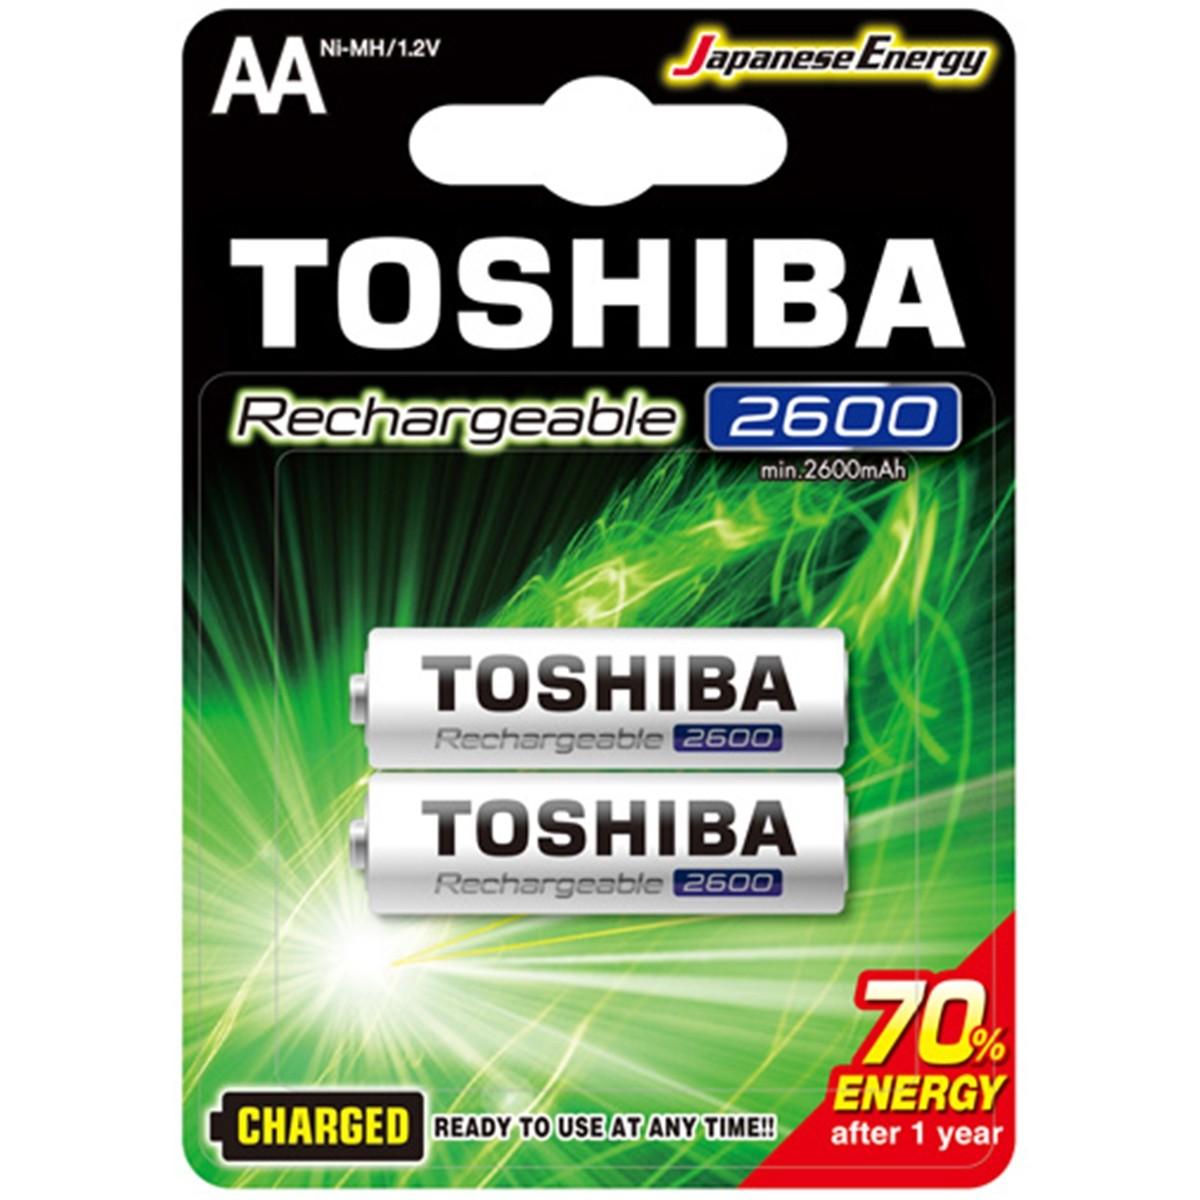 2 Pilhas Recarregáveis Toshiba AA Pequena 2600mAh TNH-6GAE BP-2C 1,2v